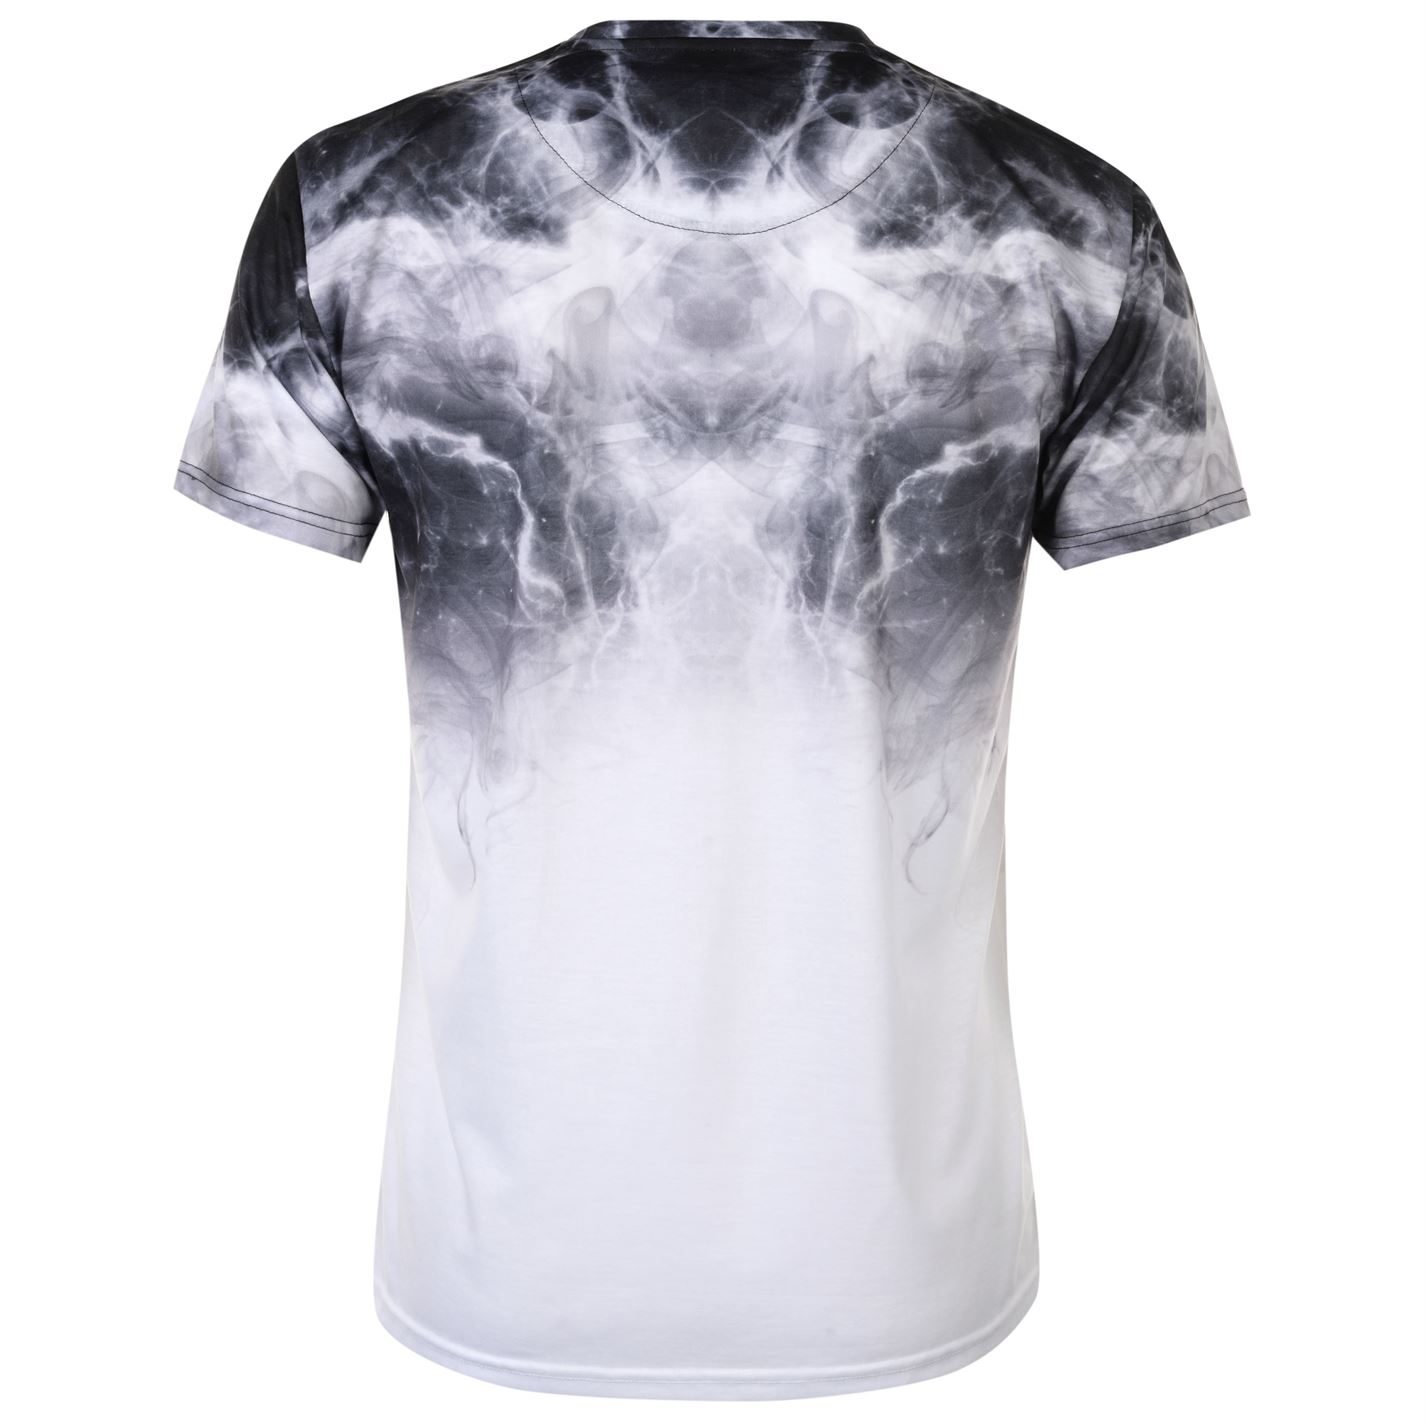 Firetrap Sub T Shirt Mens Gents Crew Neck Tee Top Short Sleeve Round Lightweight